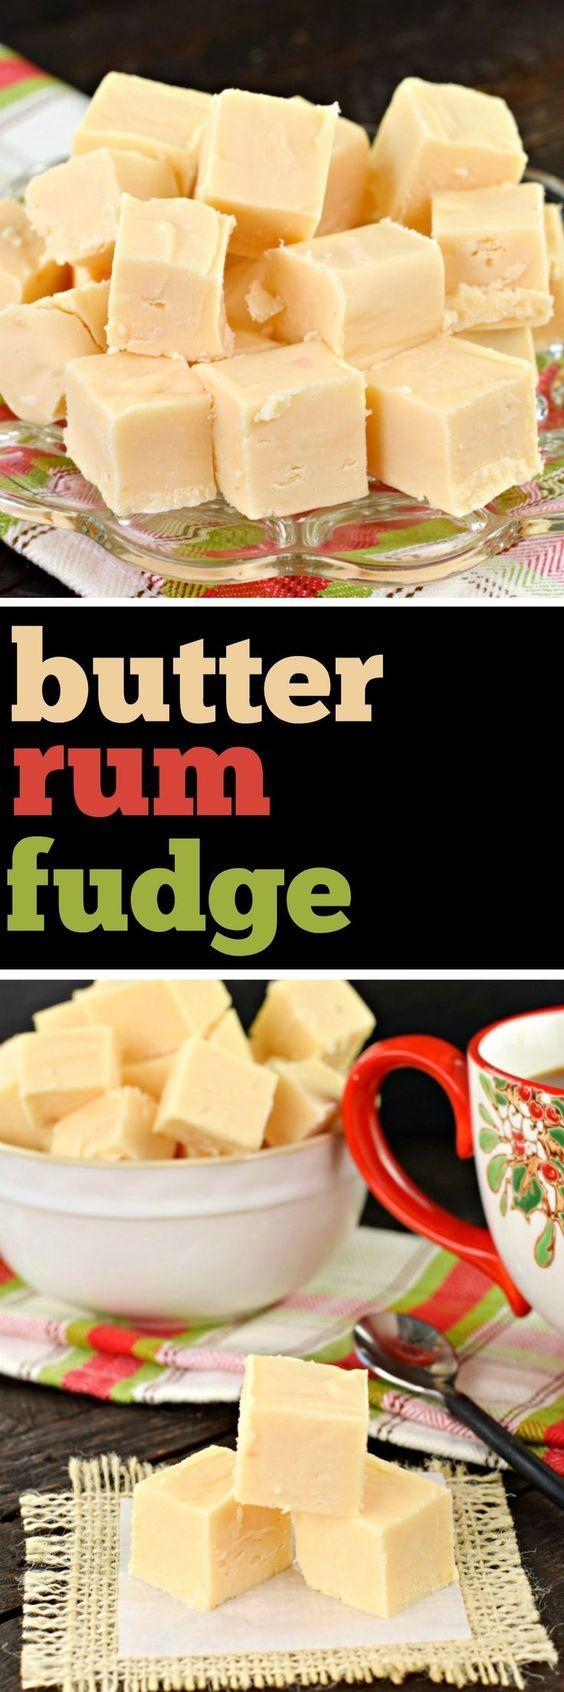 Butter Rum Fudge recipe #candy #fudge #christmas #recipe